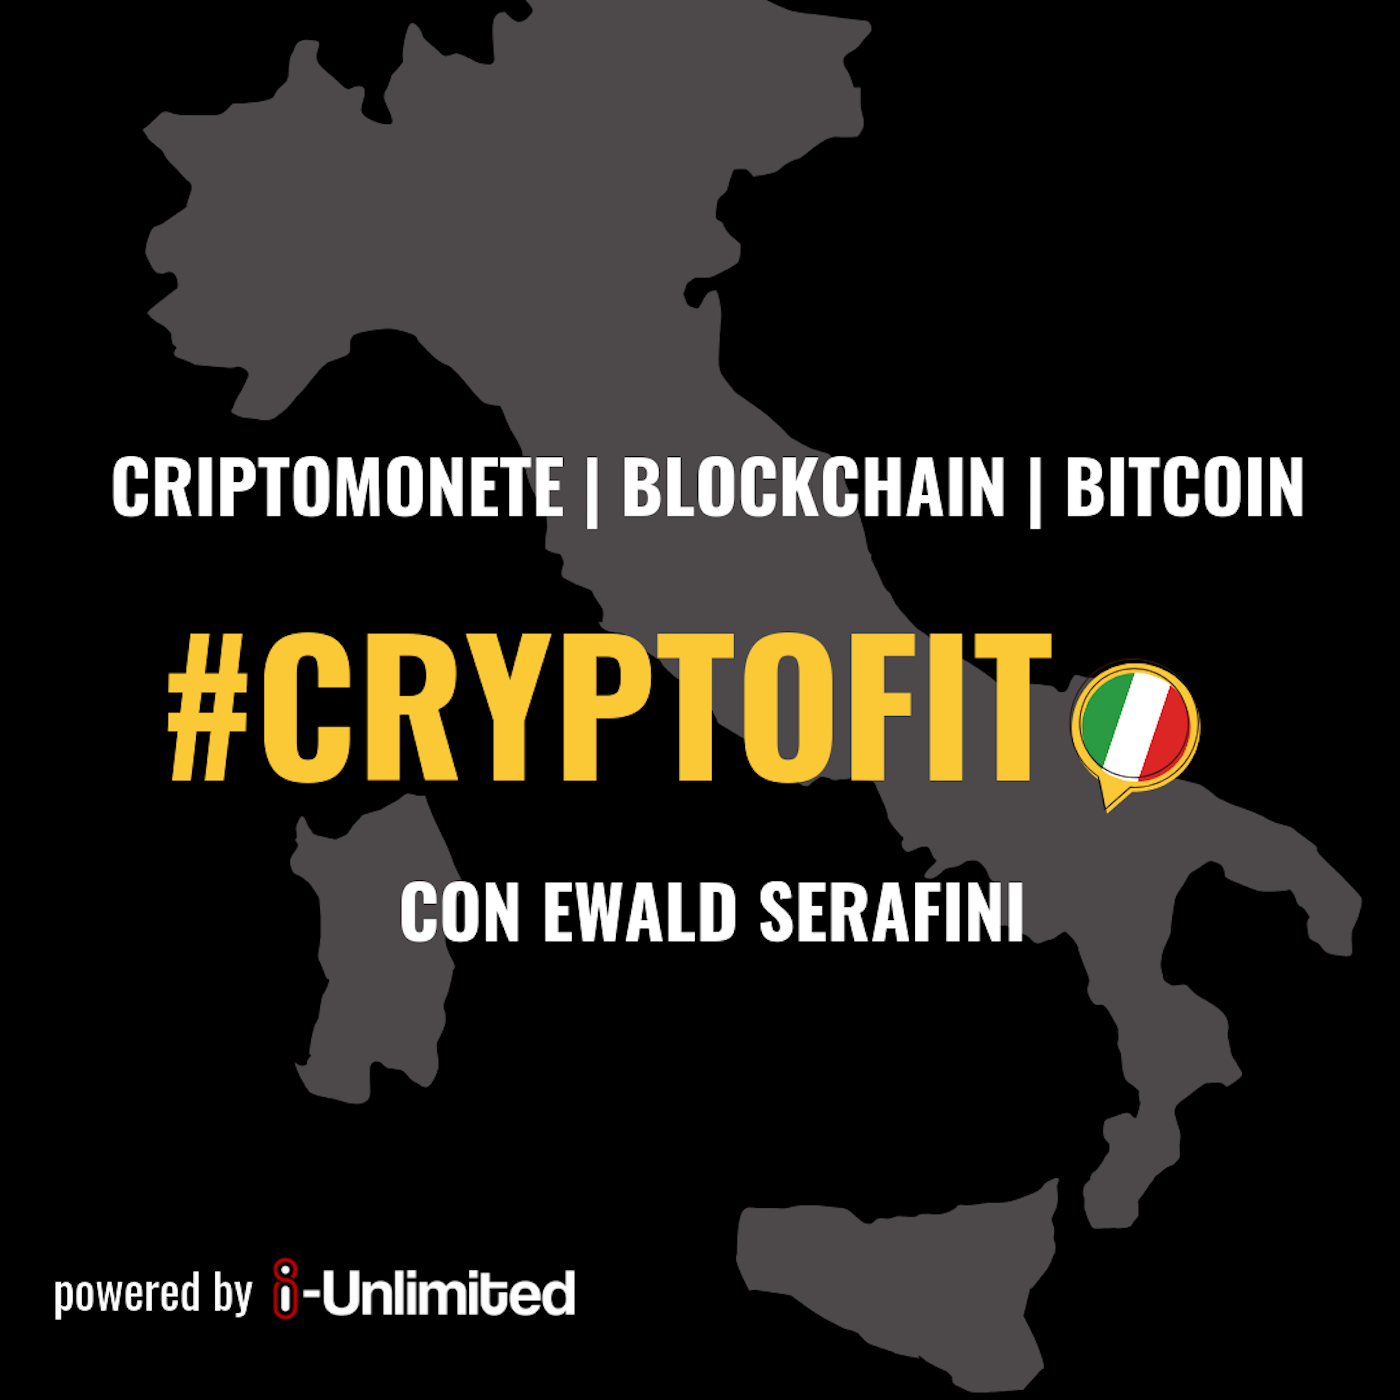 Cryptofit Italia Podcast - Criptomonete, Blockchain, Bitcoin